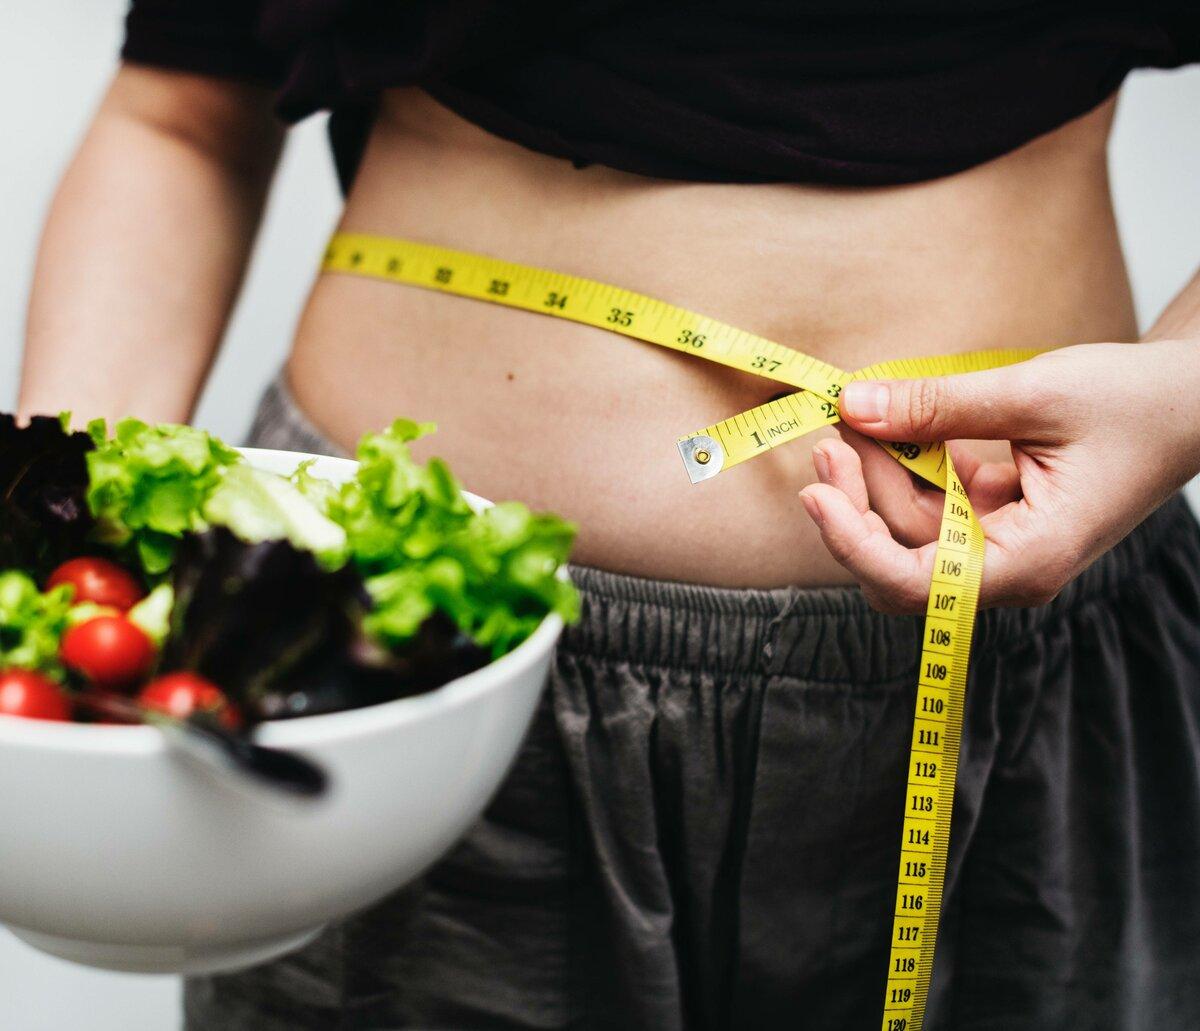 Похудеть дома без вреда